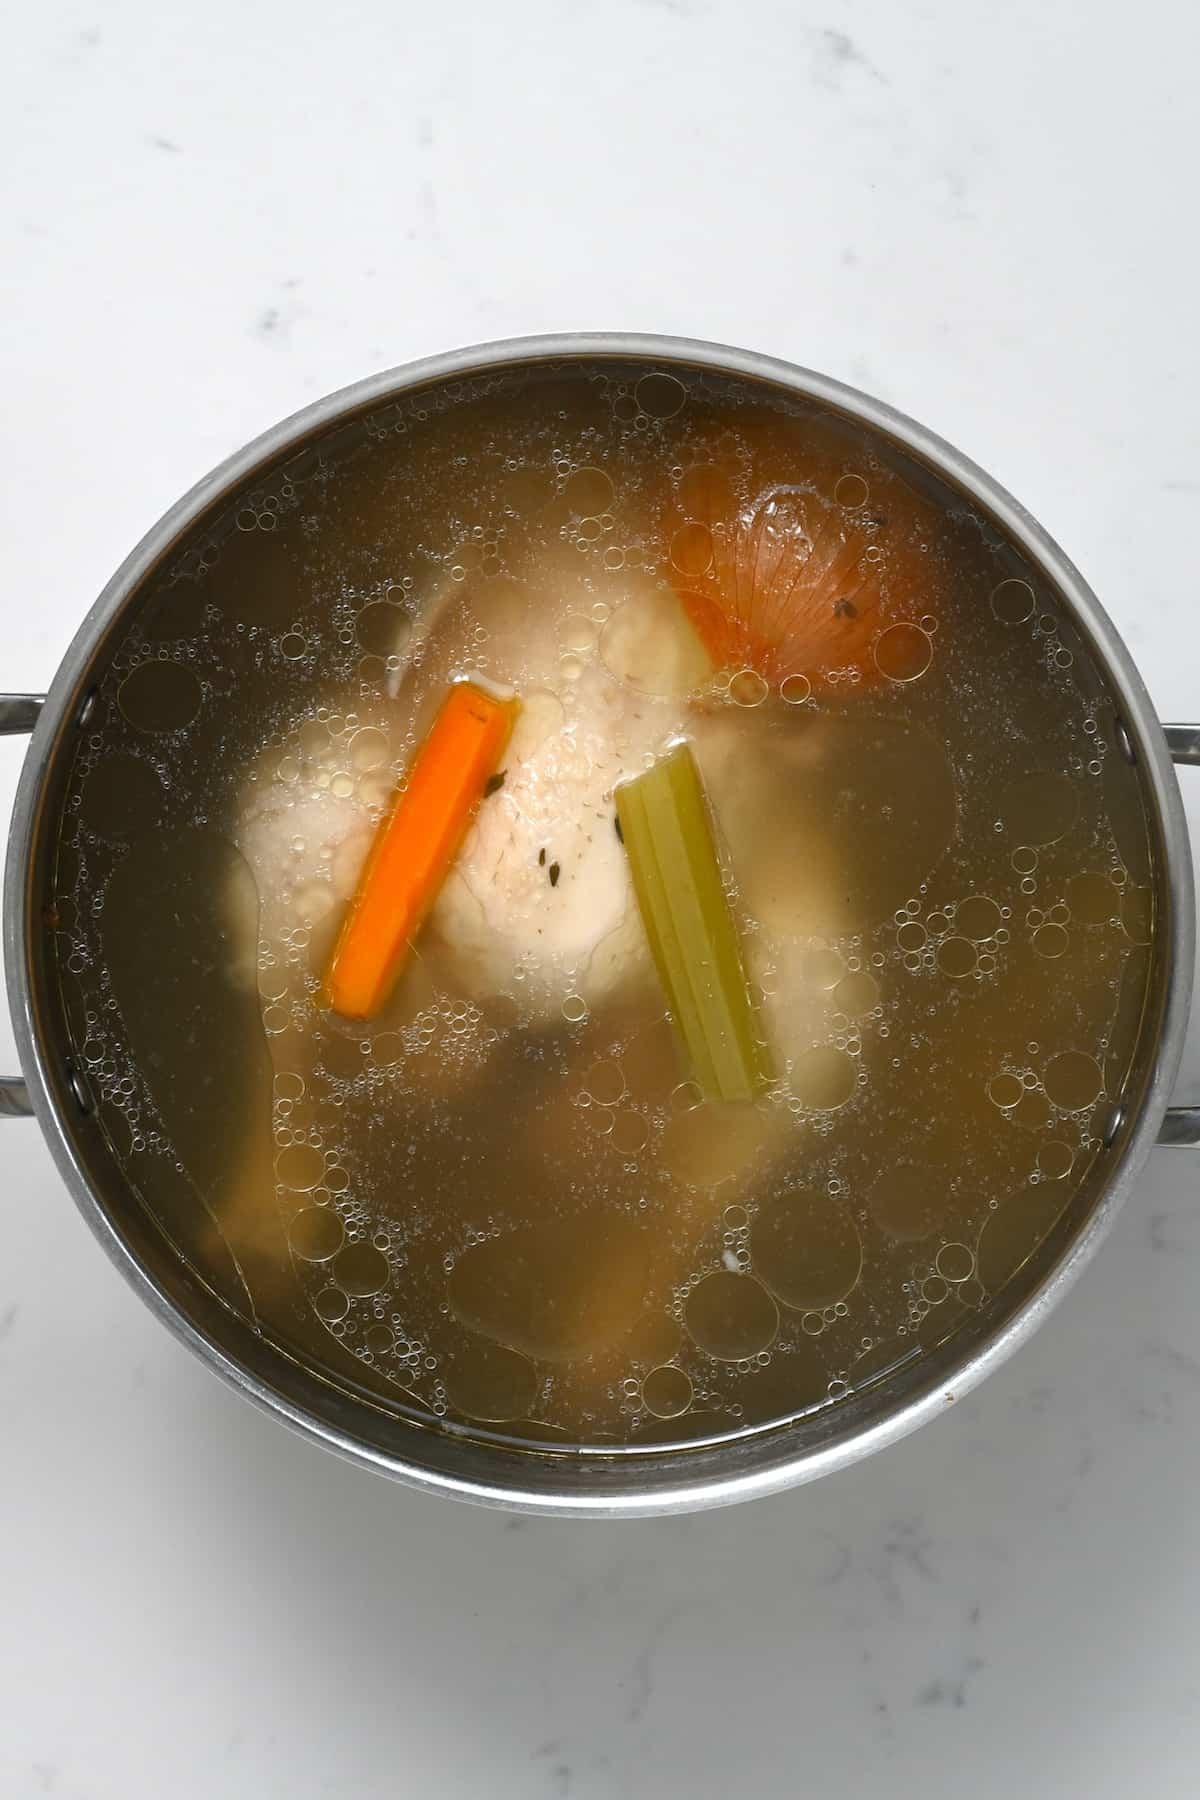 Homemade chicken stock in a pot